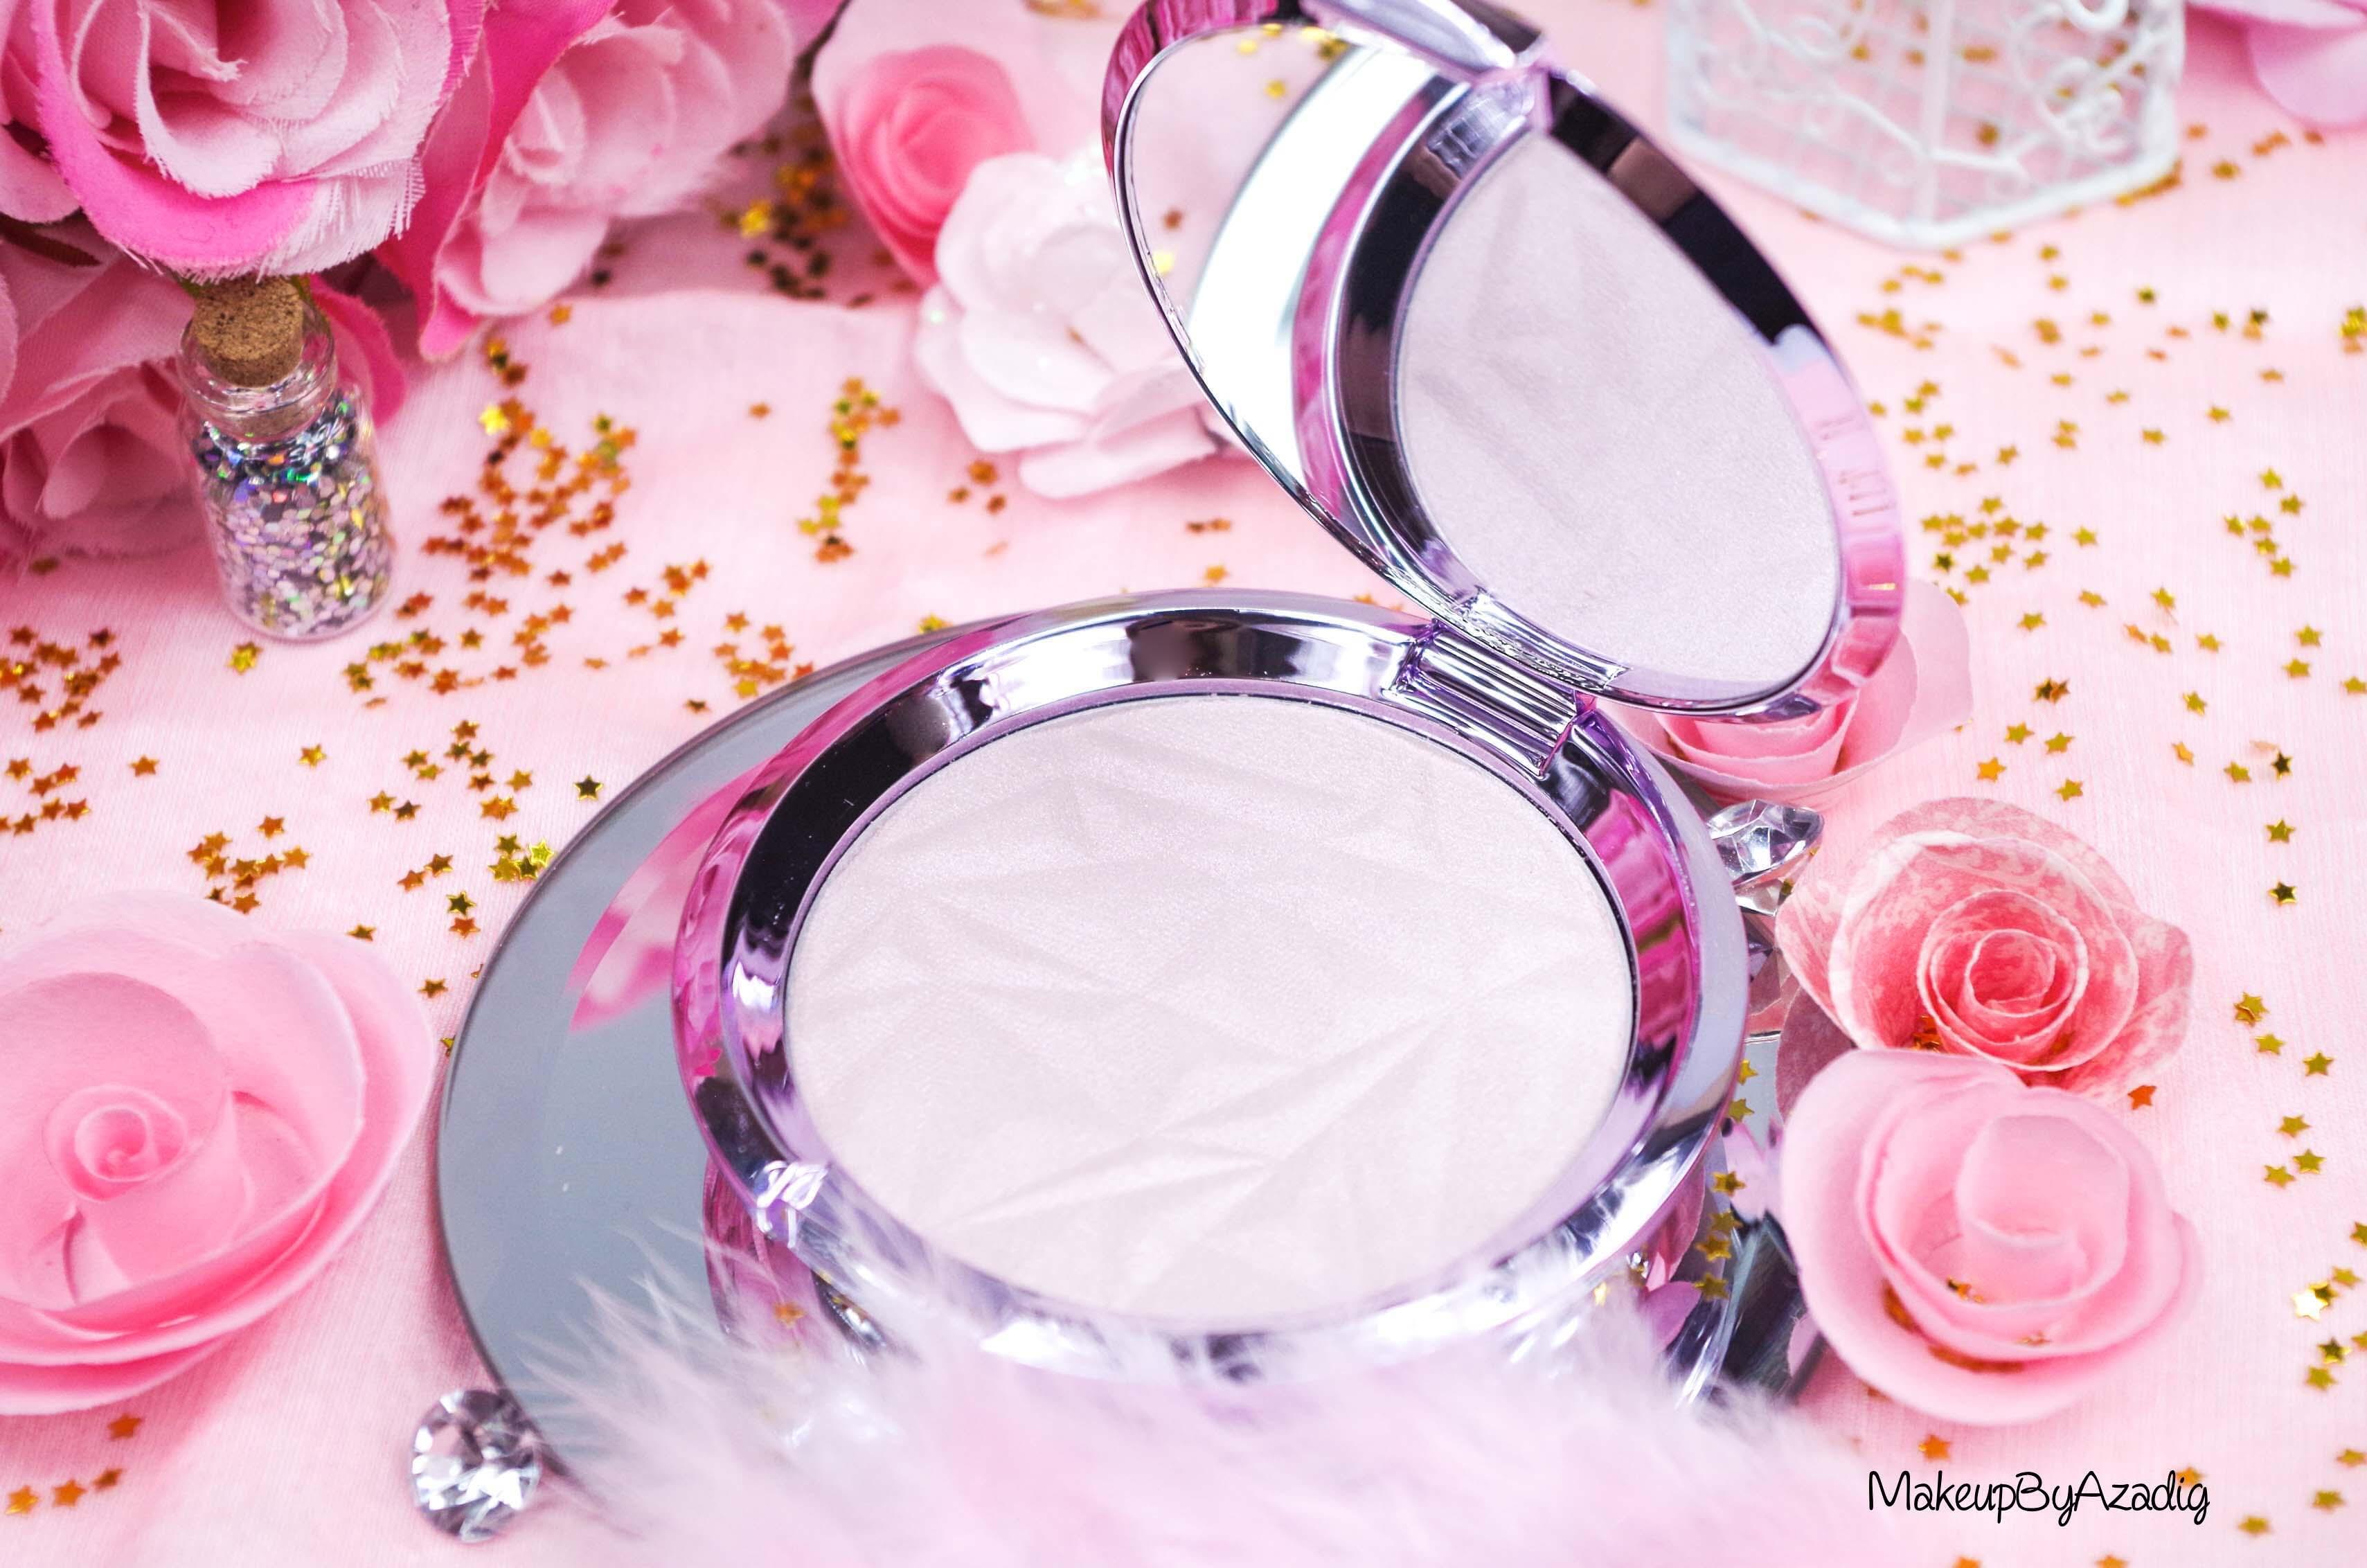 revue-becca-shimmering-skin-perfector-pressed-highlighter-enlumineur-violet-prismatic-amethyst-avis-swatch-prix-makeupbyazadig-sananas-2